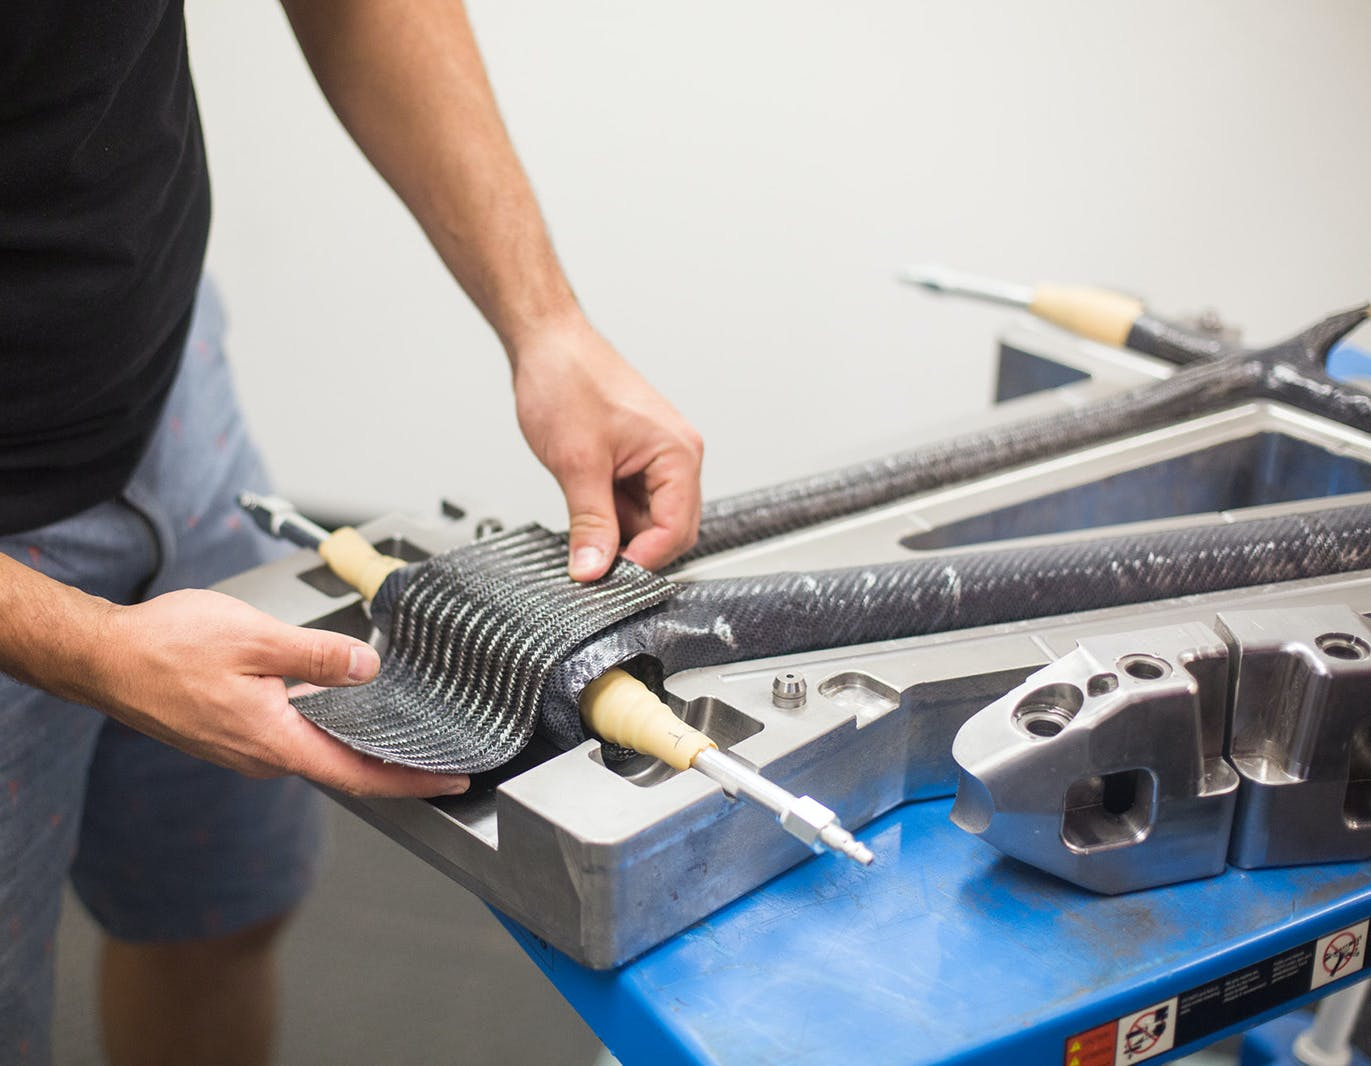 Wrapping carbon fiber onto a frame